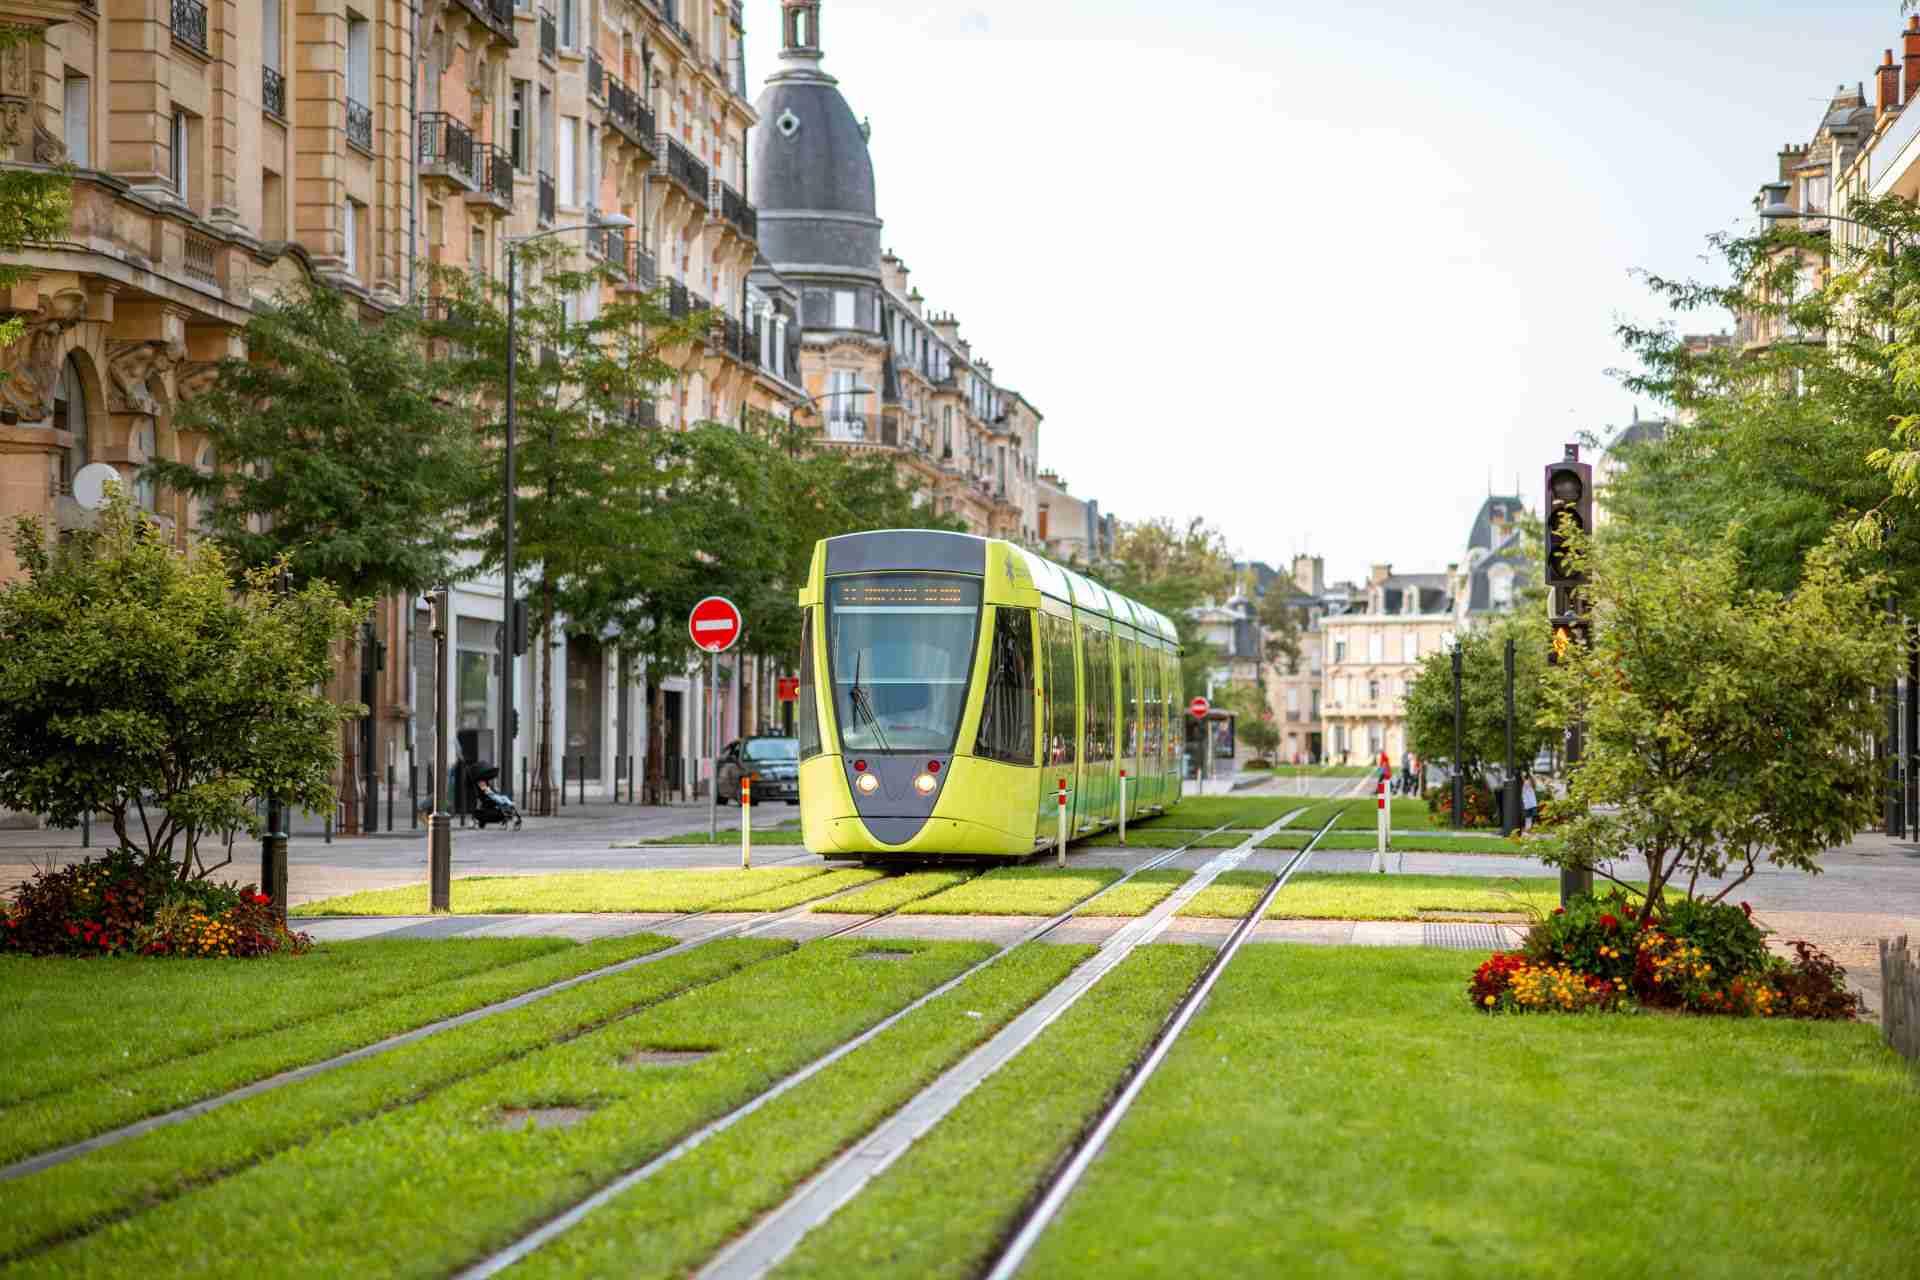 Reims Tram Urban Transport System